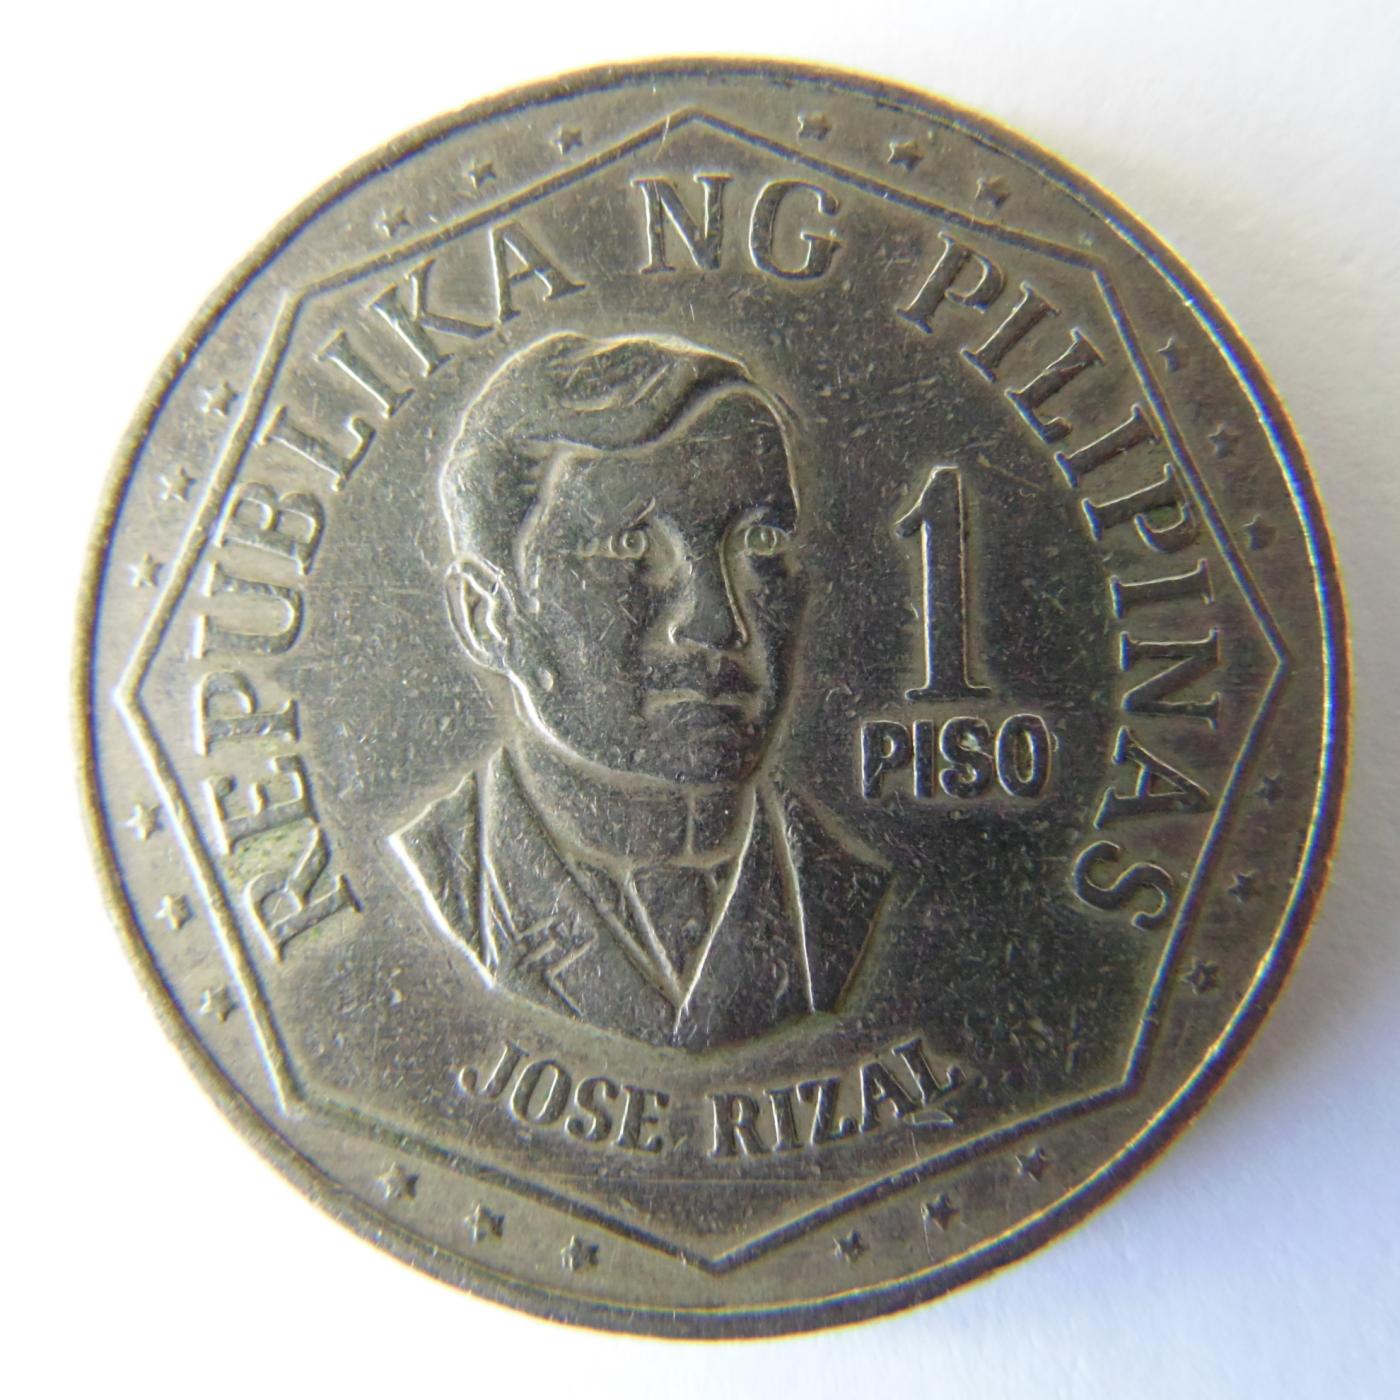 01.11.2014 Belize 2 Dollars QEII//Animals//Ruins//66e UNC